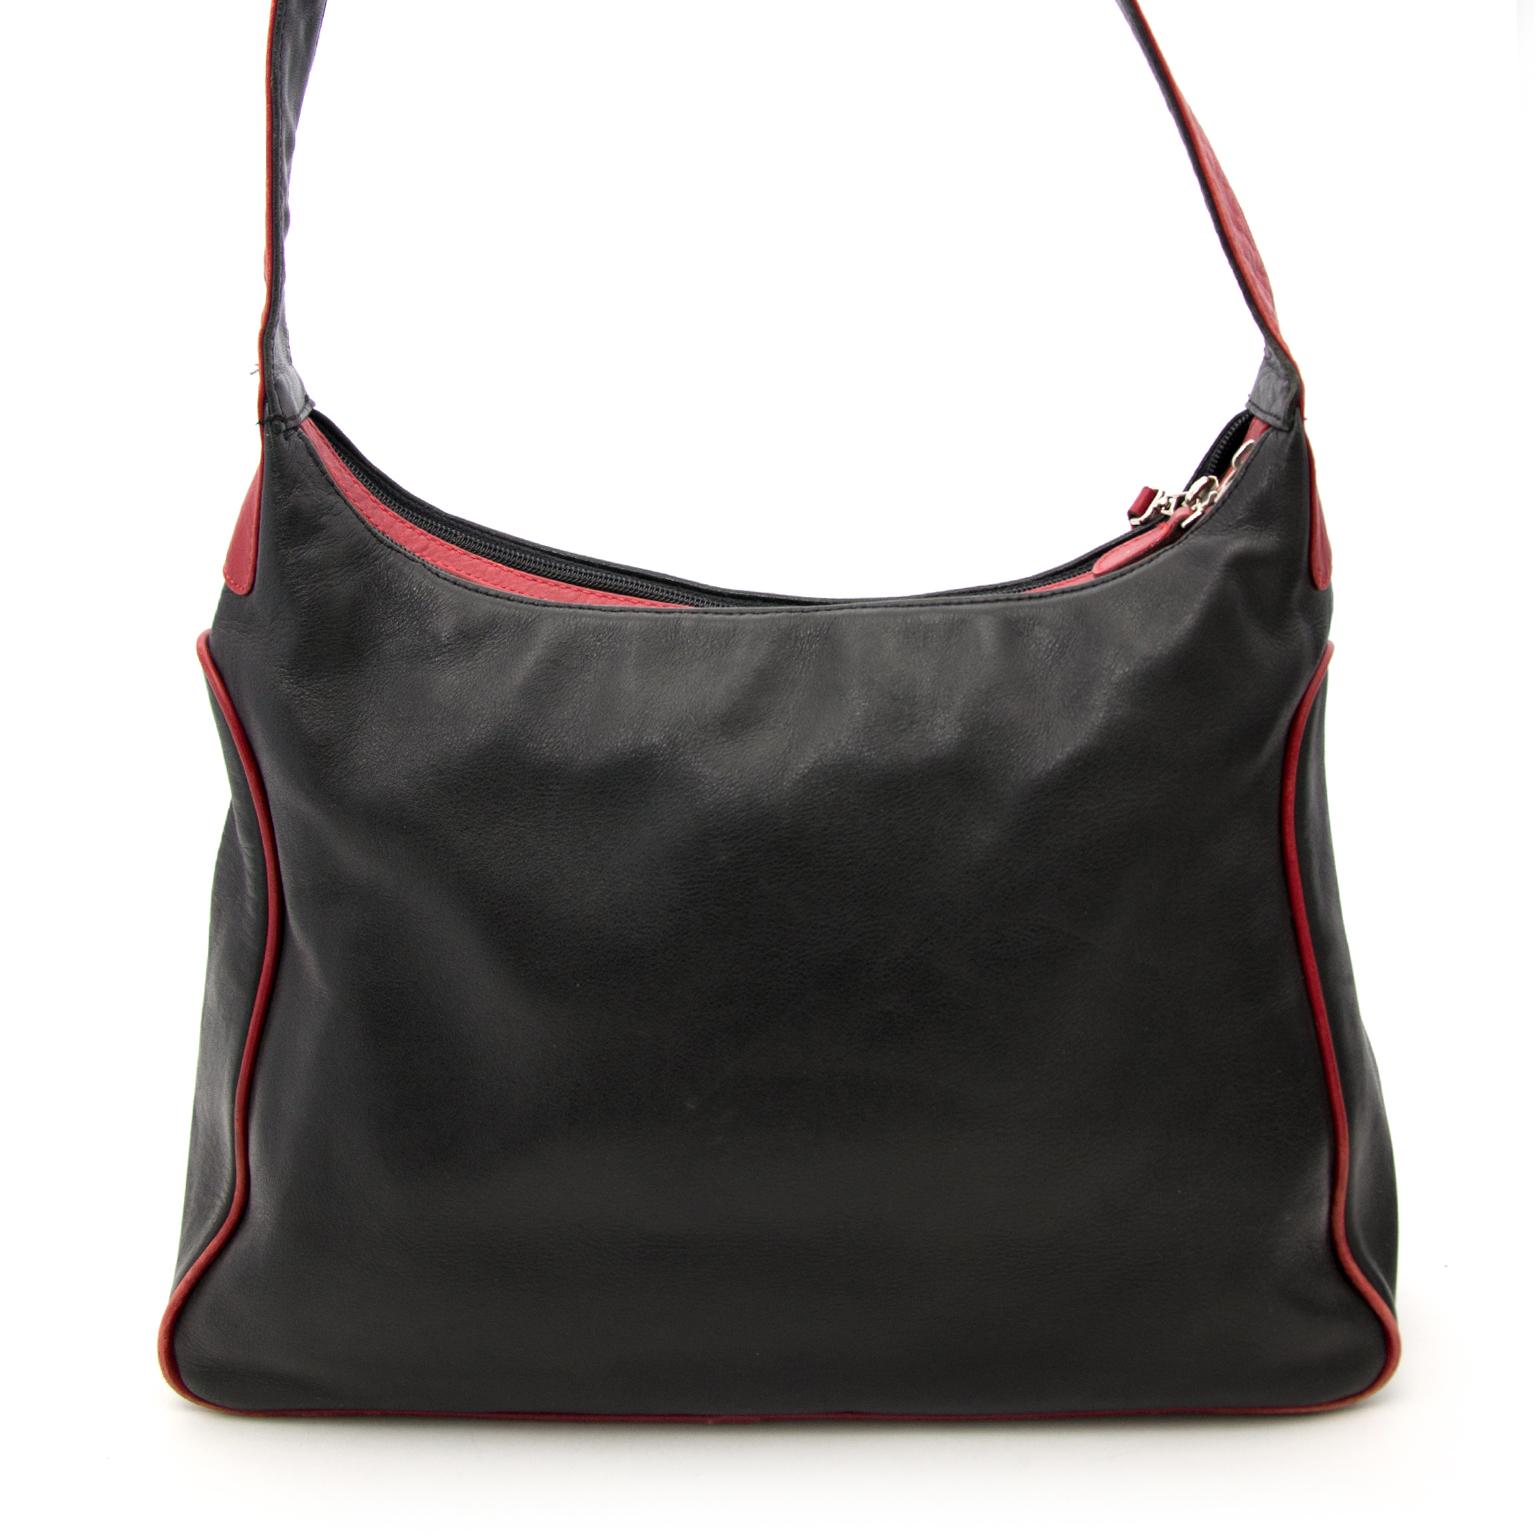 2afc4a897 Labellov Buy authentic vintagePrada designer bags, shoes, clothes ...